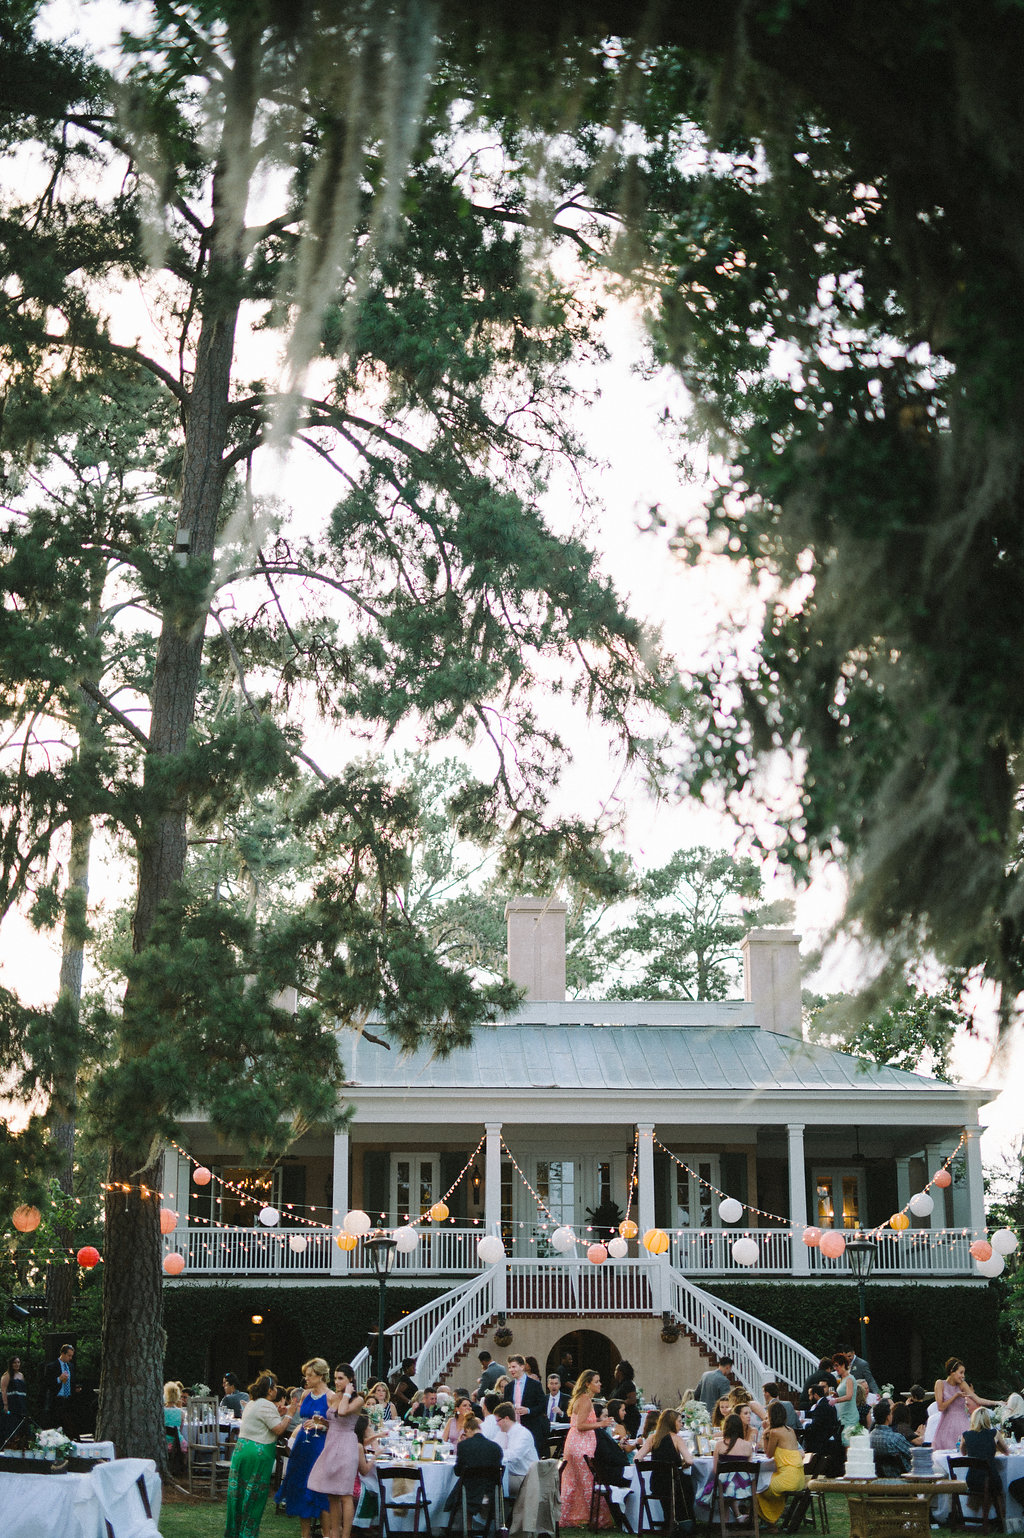 meagan-and-brenden-rach-loves-troy-photography-ivory-and-beau-bridal-boutqiue-ti-adora-wedding-dress-gold-lace-wedding-dress-savannah-wedding-planner-savannah-weddings-oldfield-plantation-wedding-savannah-florist-53.jpg